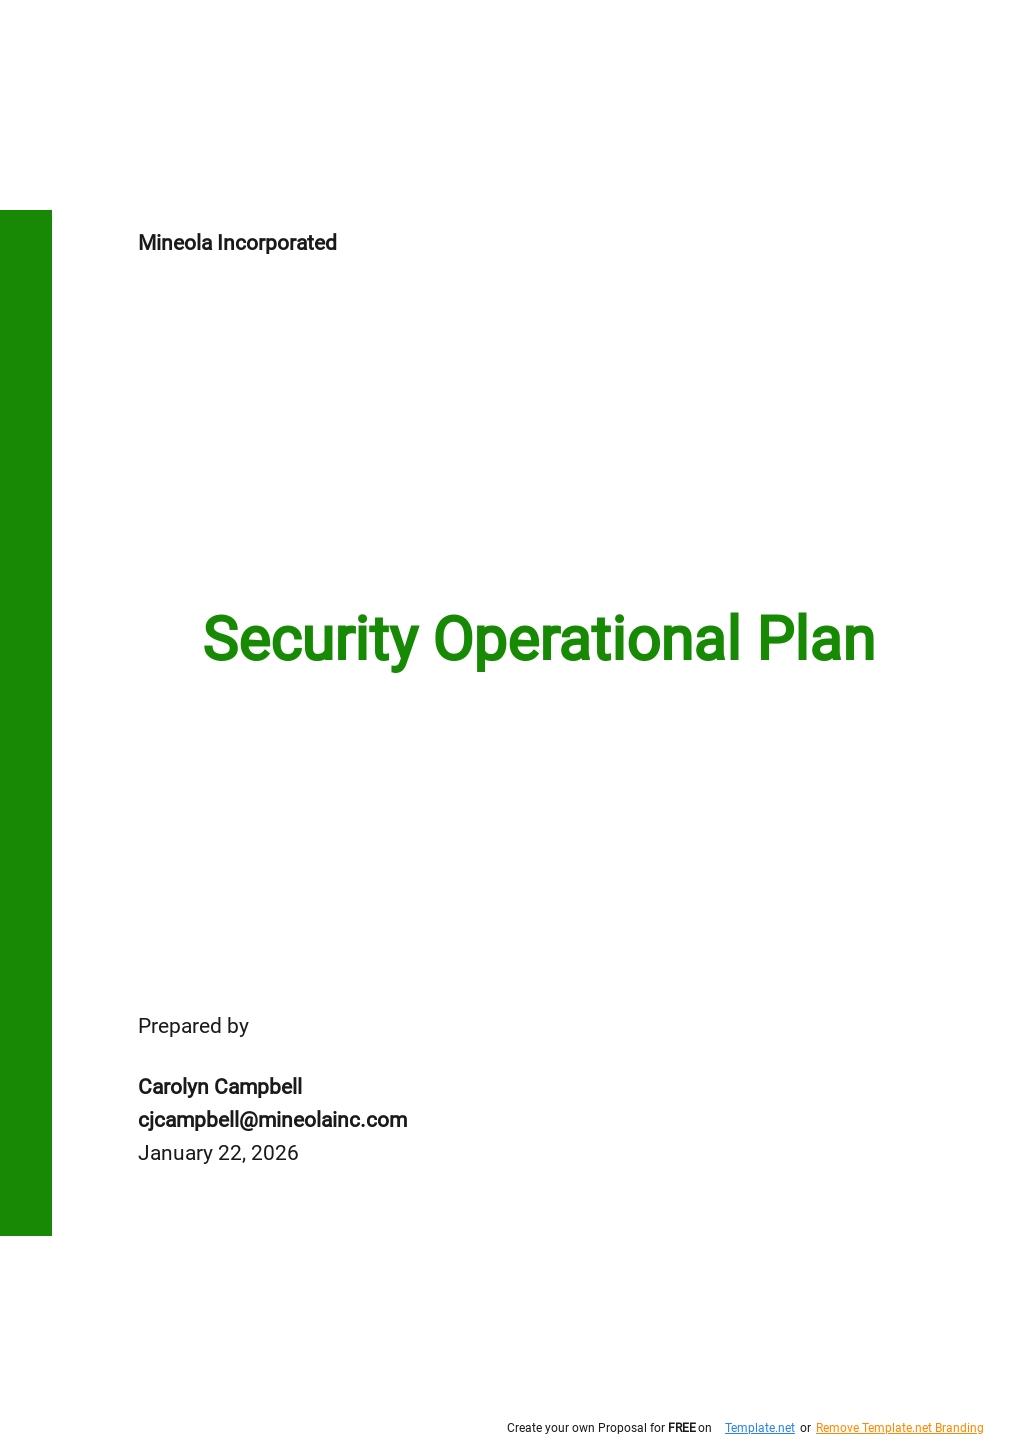 Security Operational Plan Template.jpe